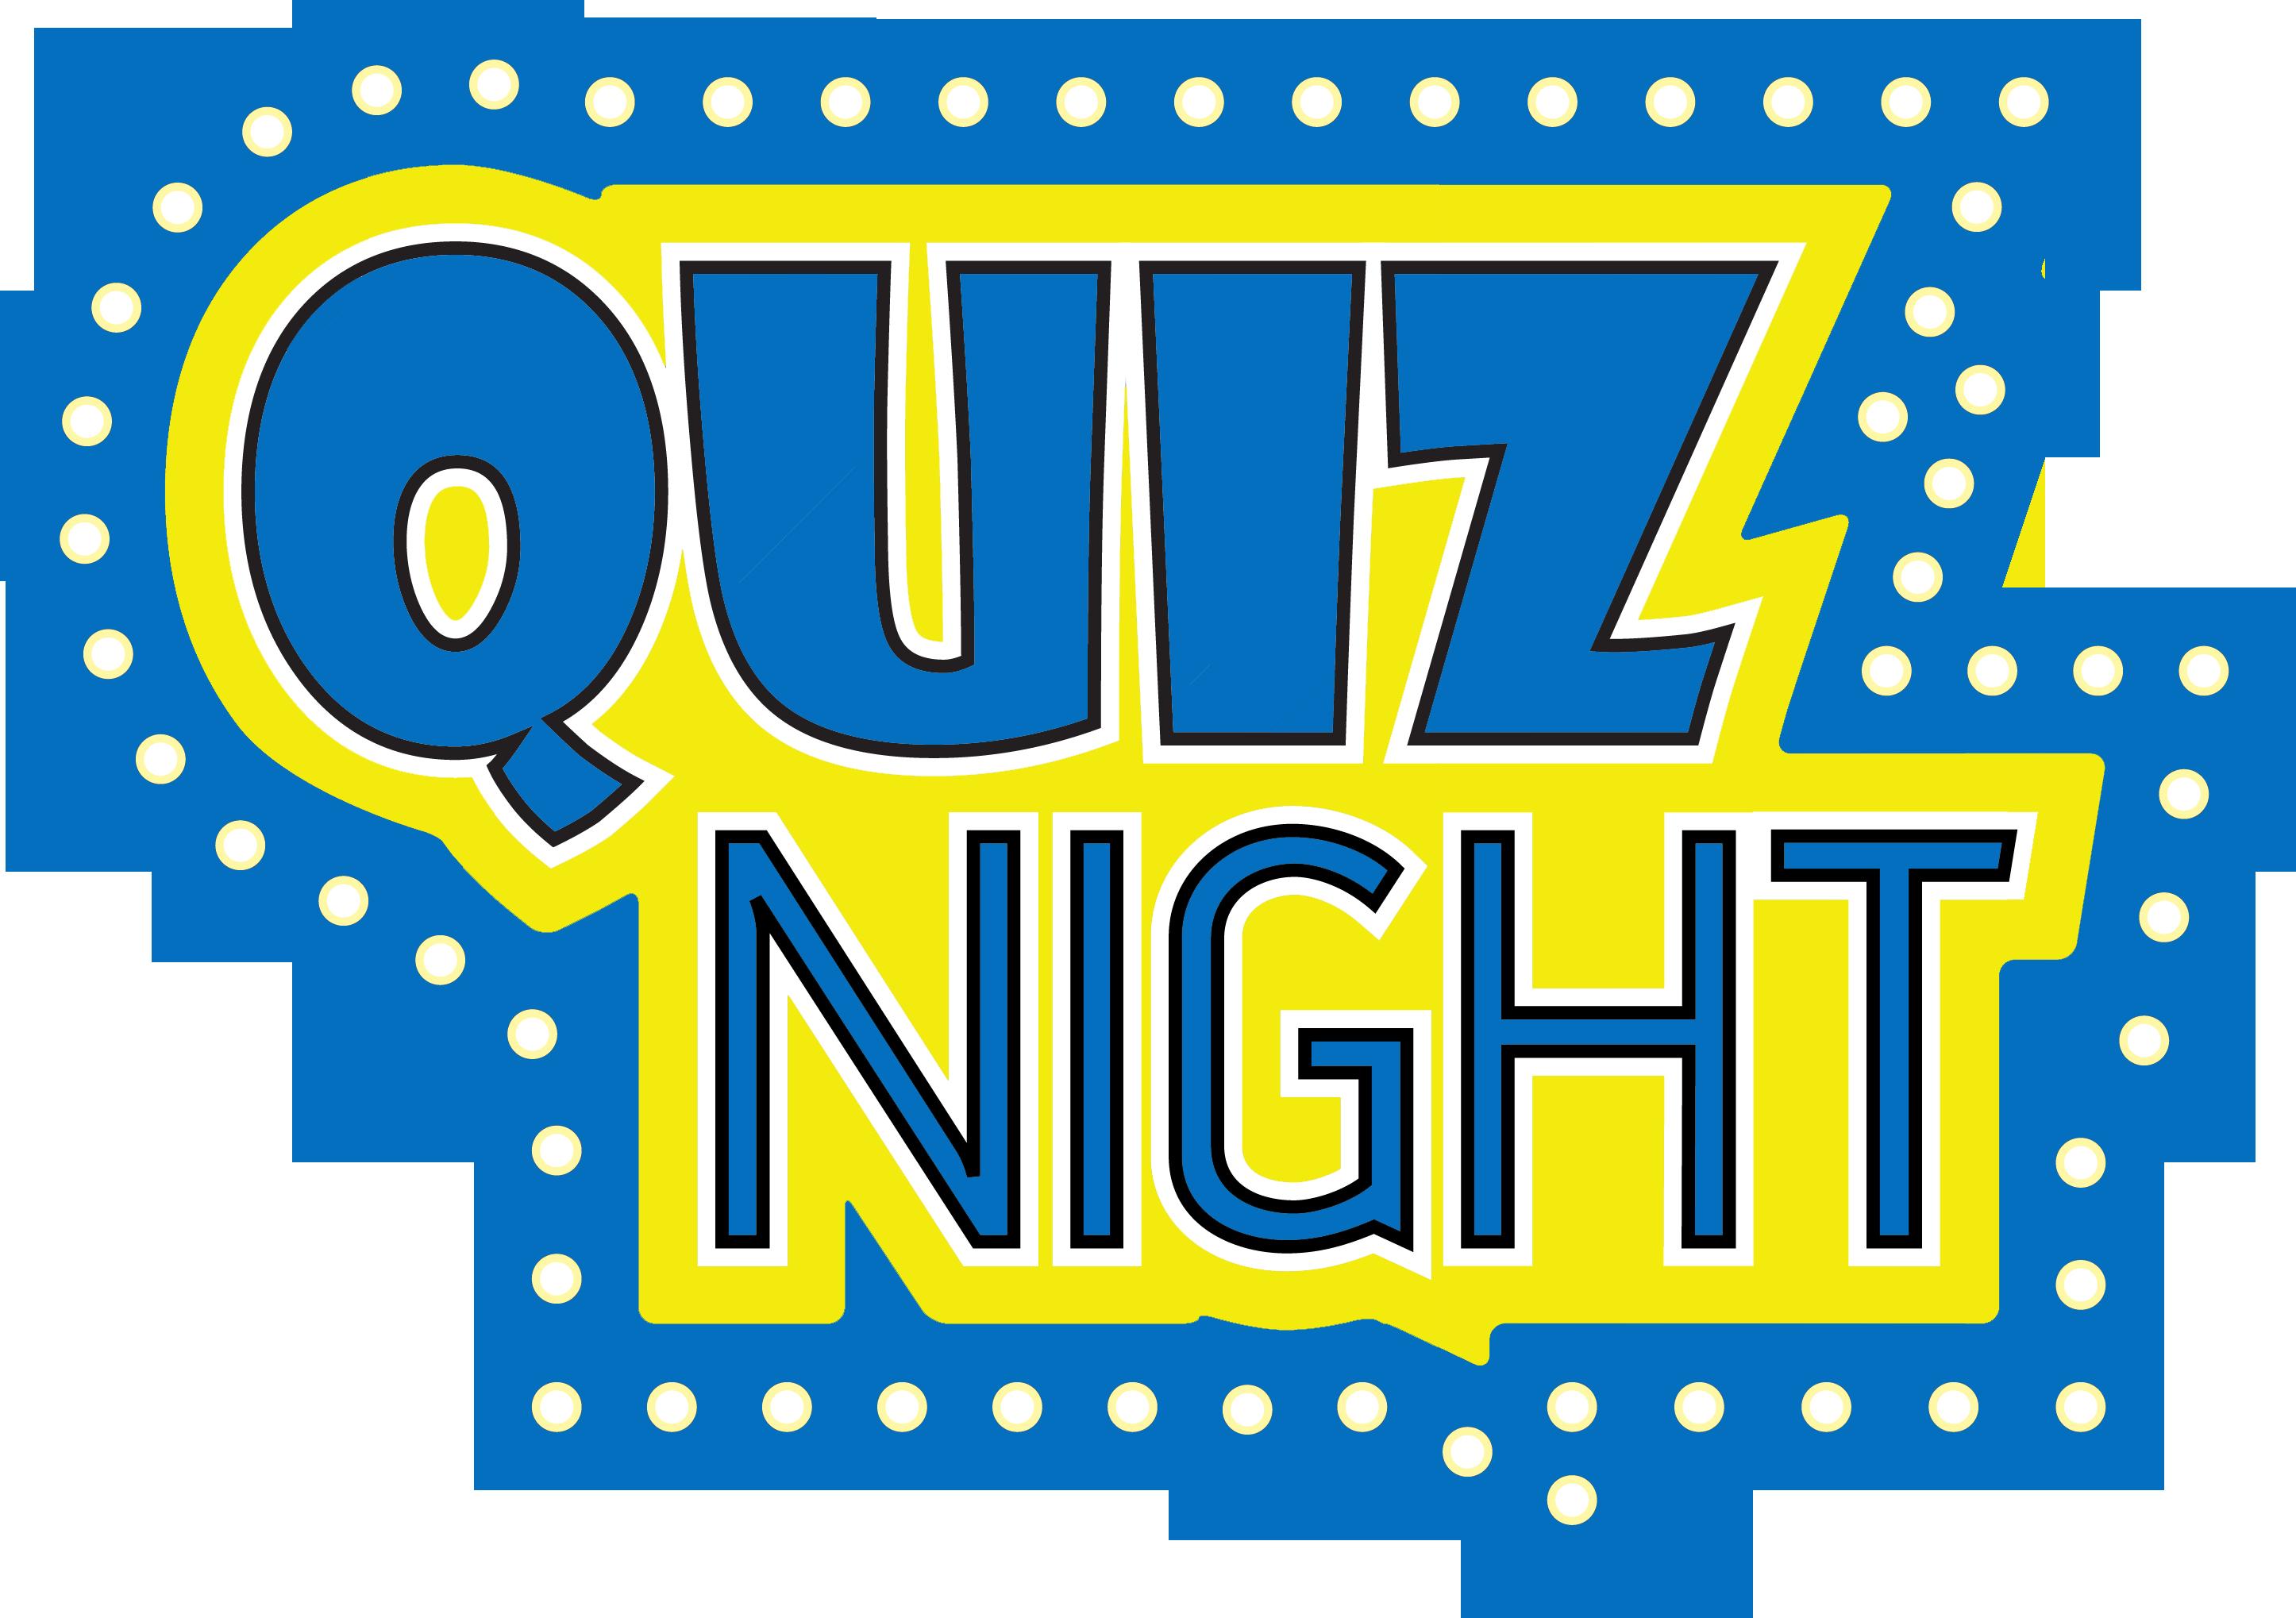 Quiz nd feb tickets. Ticket clipart opening night